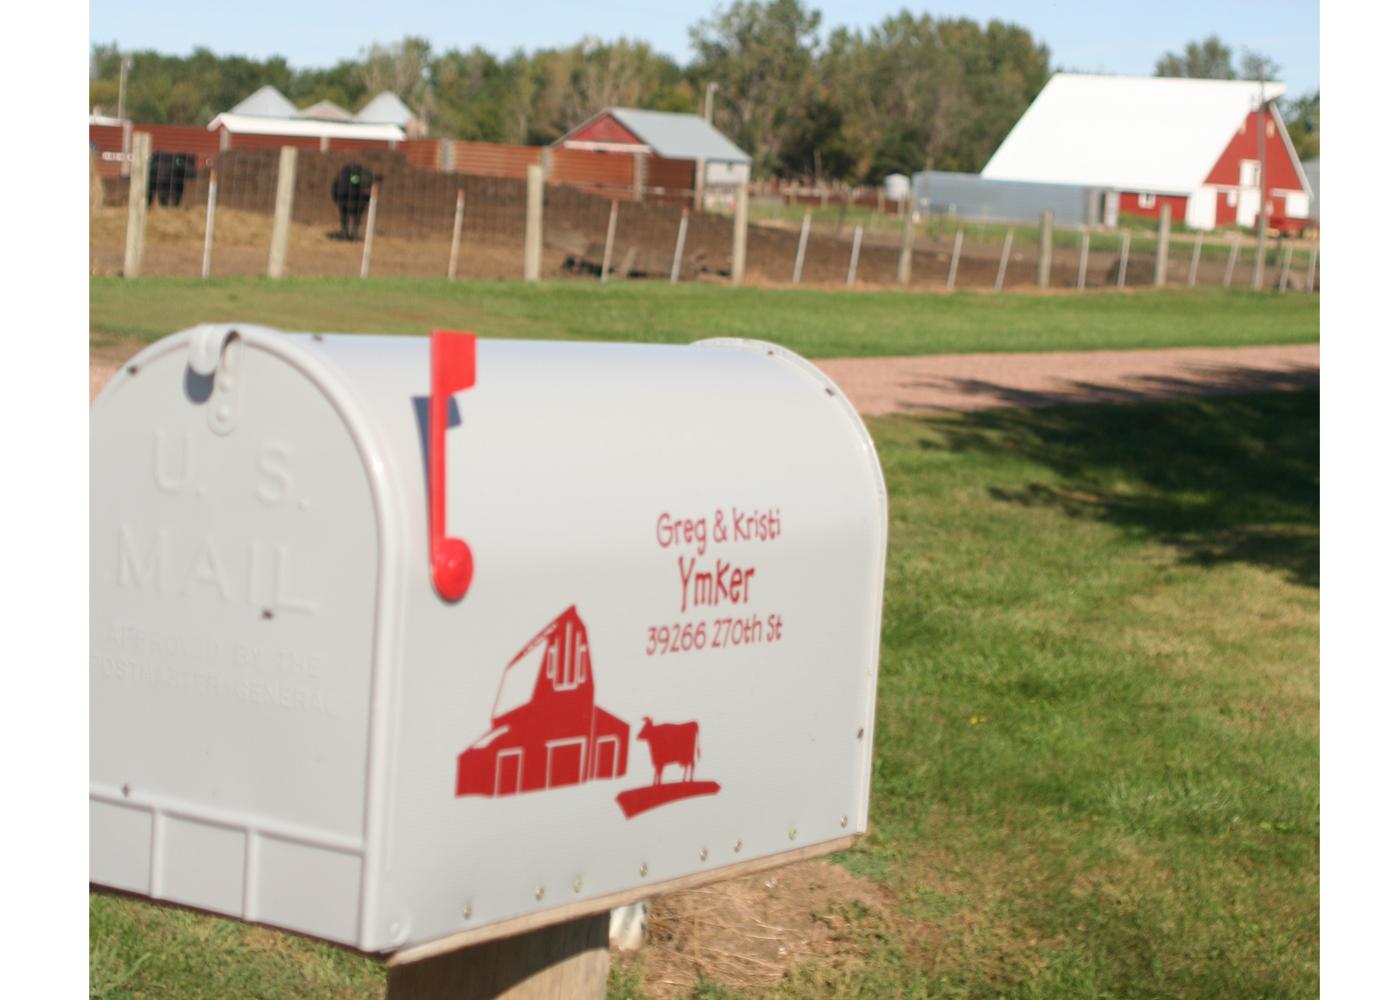 farm-scene-with-address-vinyl-decal-on-white-mailbox.jpg